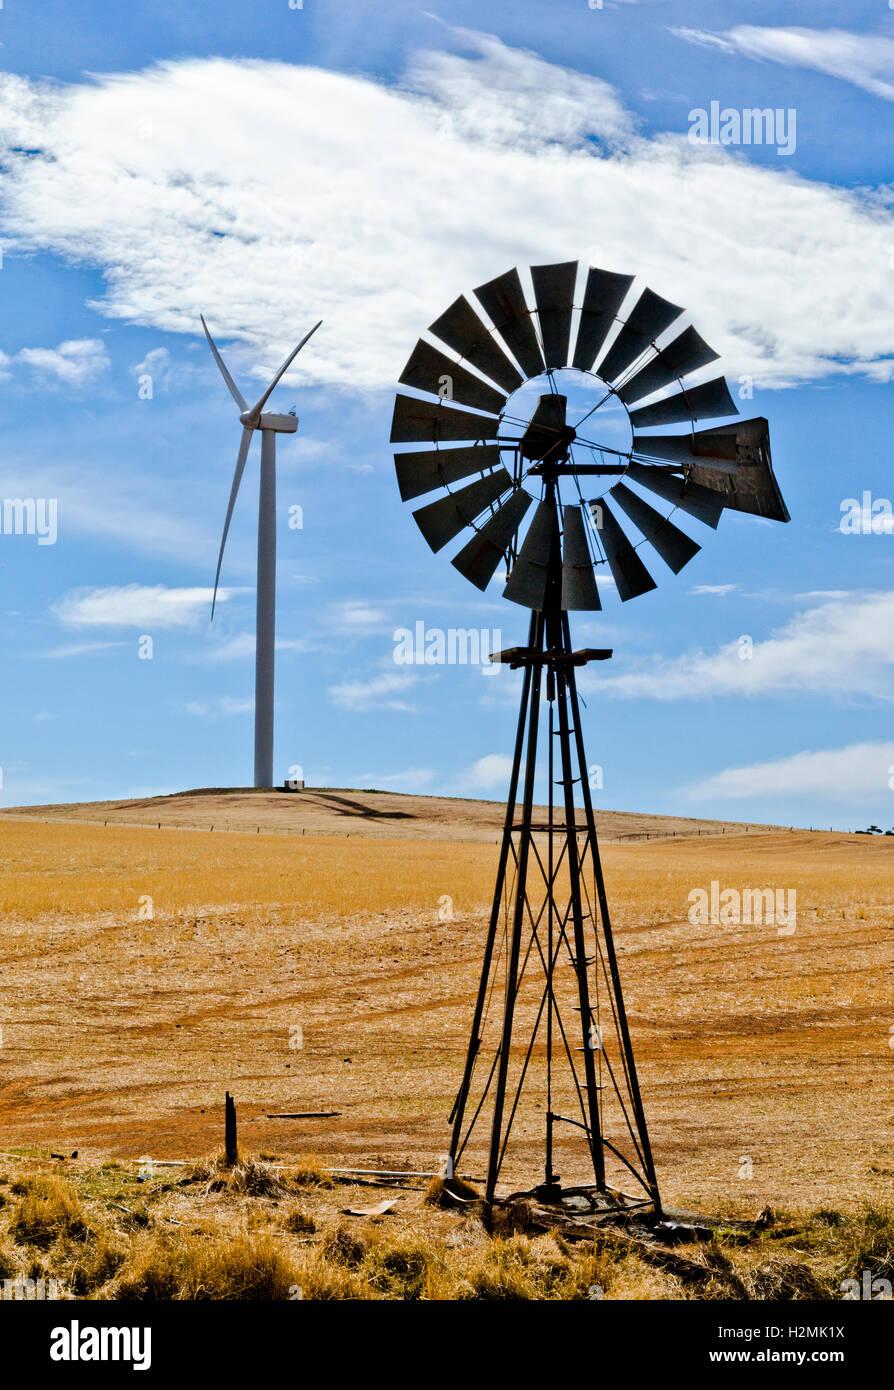 old windmill and modern wind turbine at the bluff range